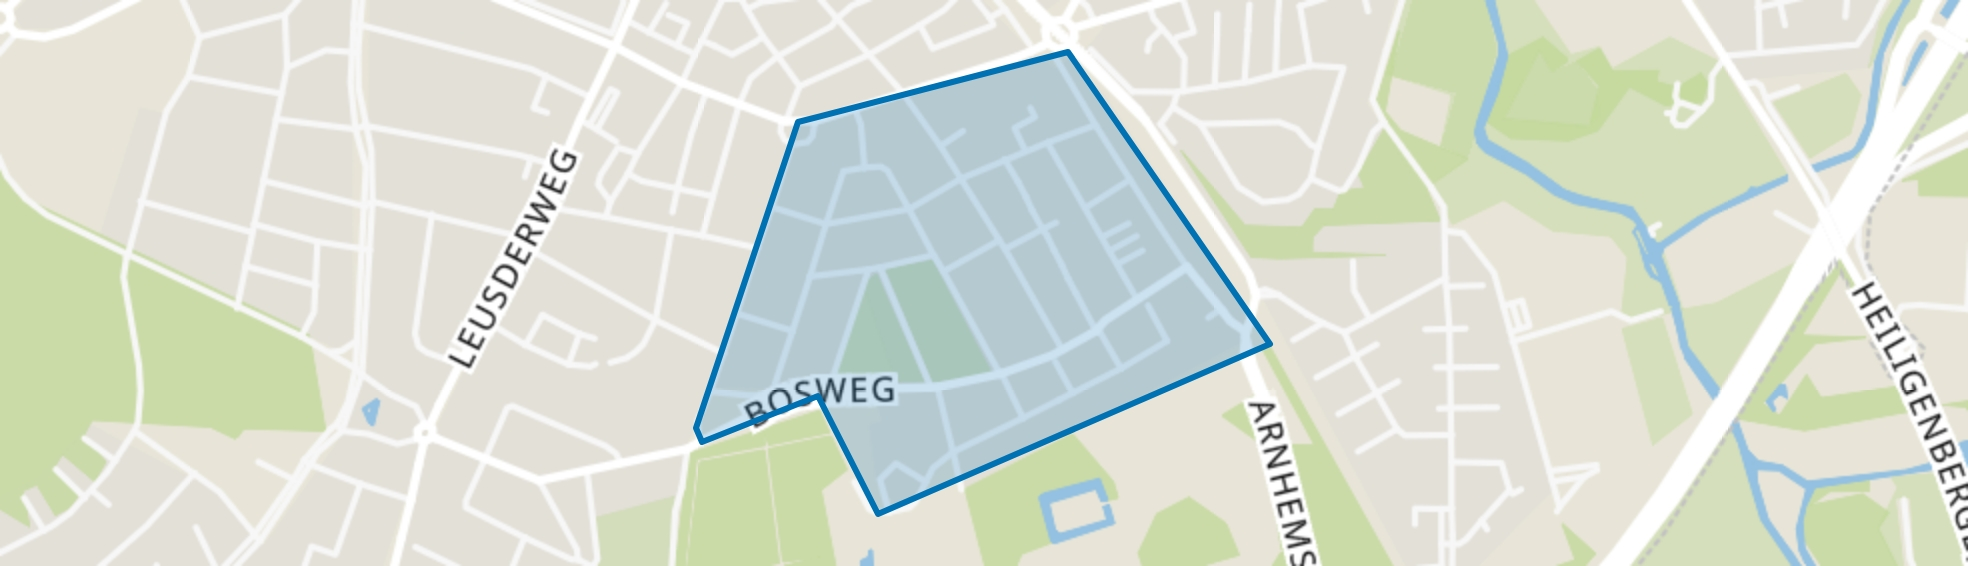 Bosweg, Amersfoort map